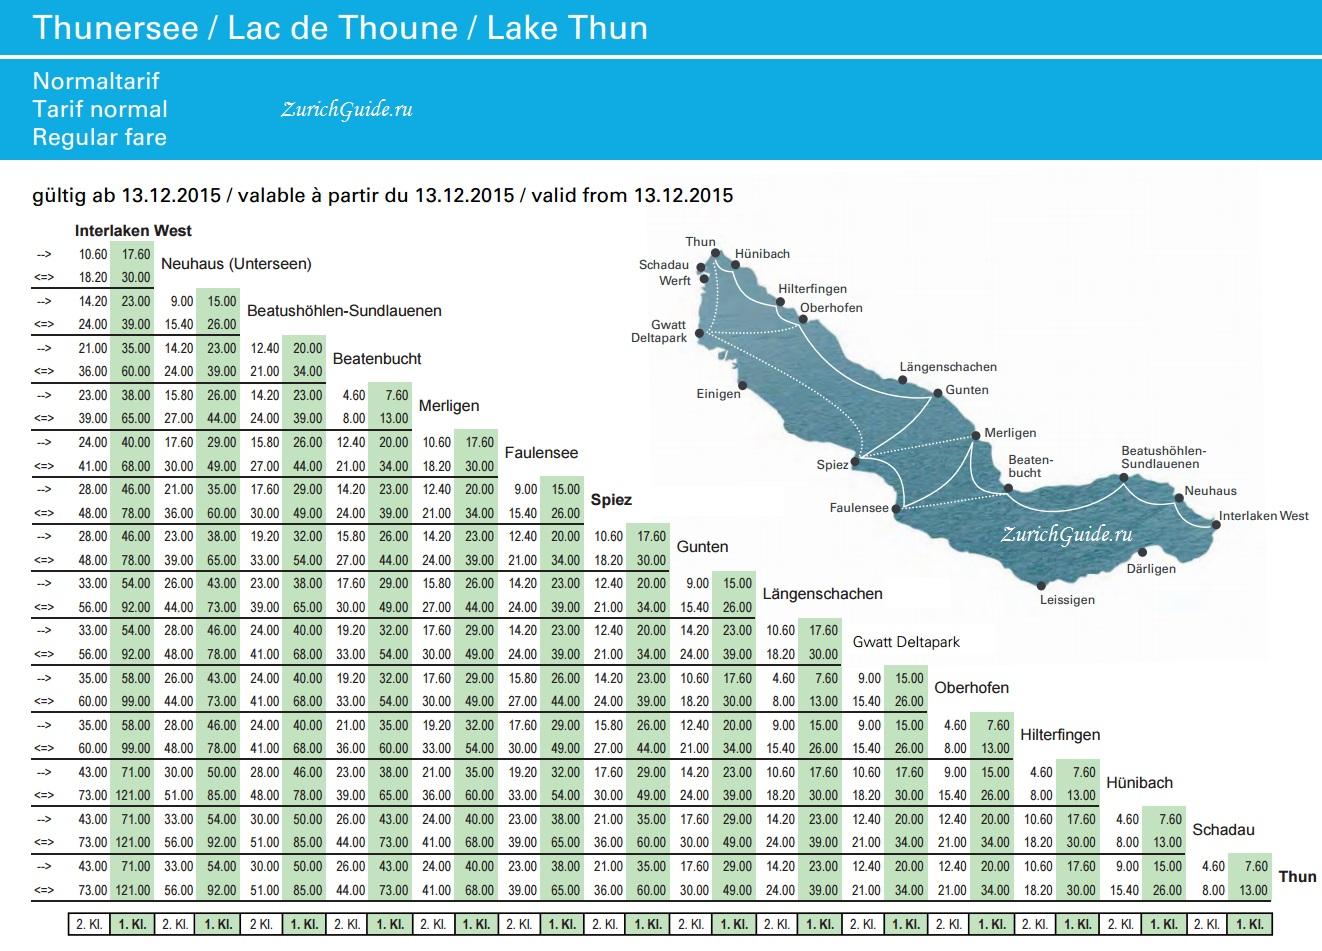 Расписание круизов по озеру Тун - Тунское озеро (Thunersee)